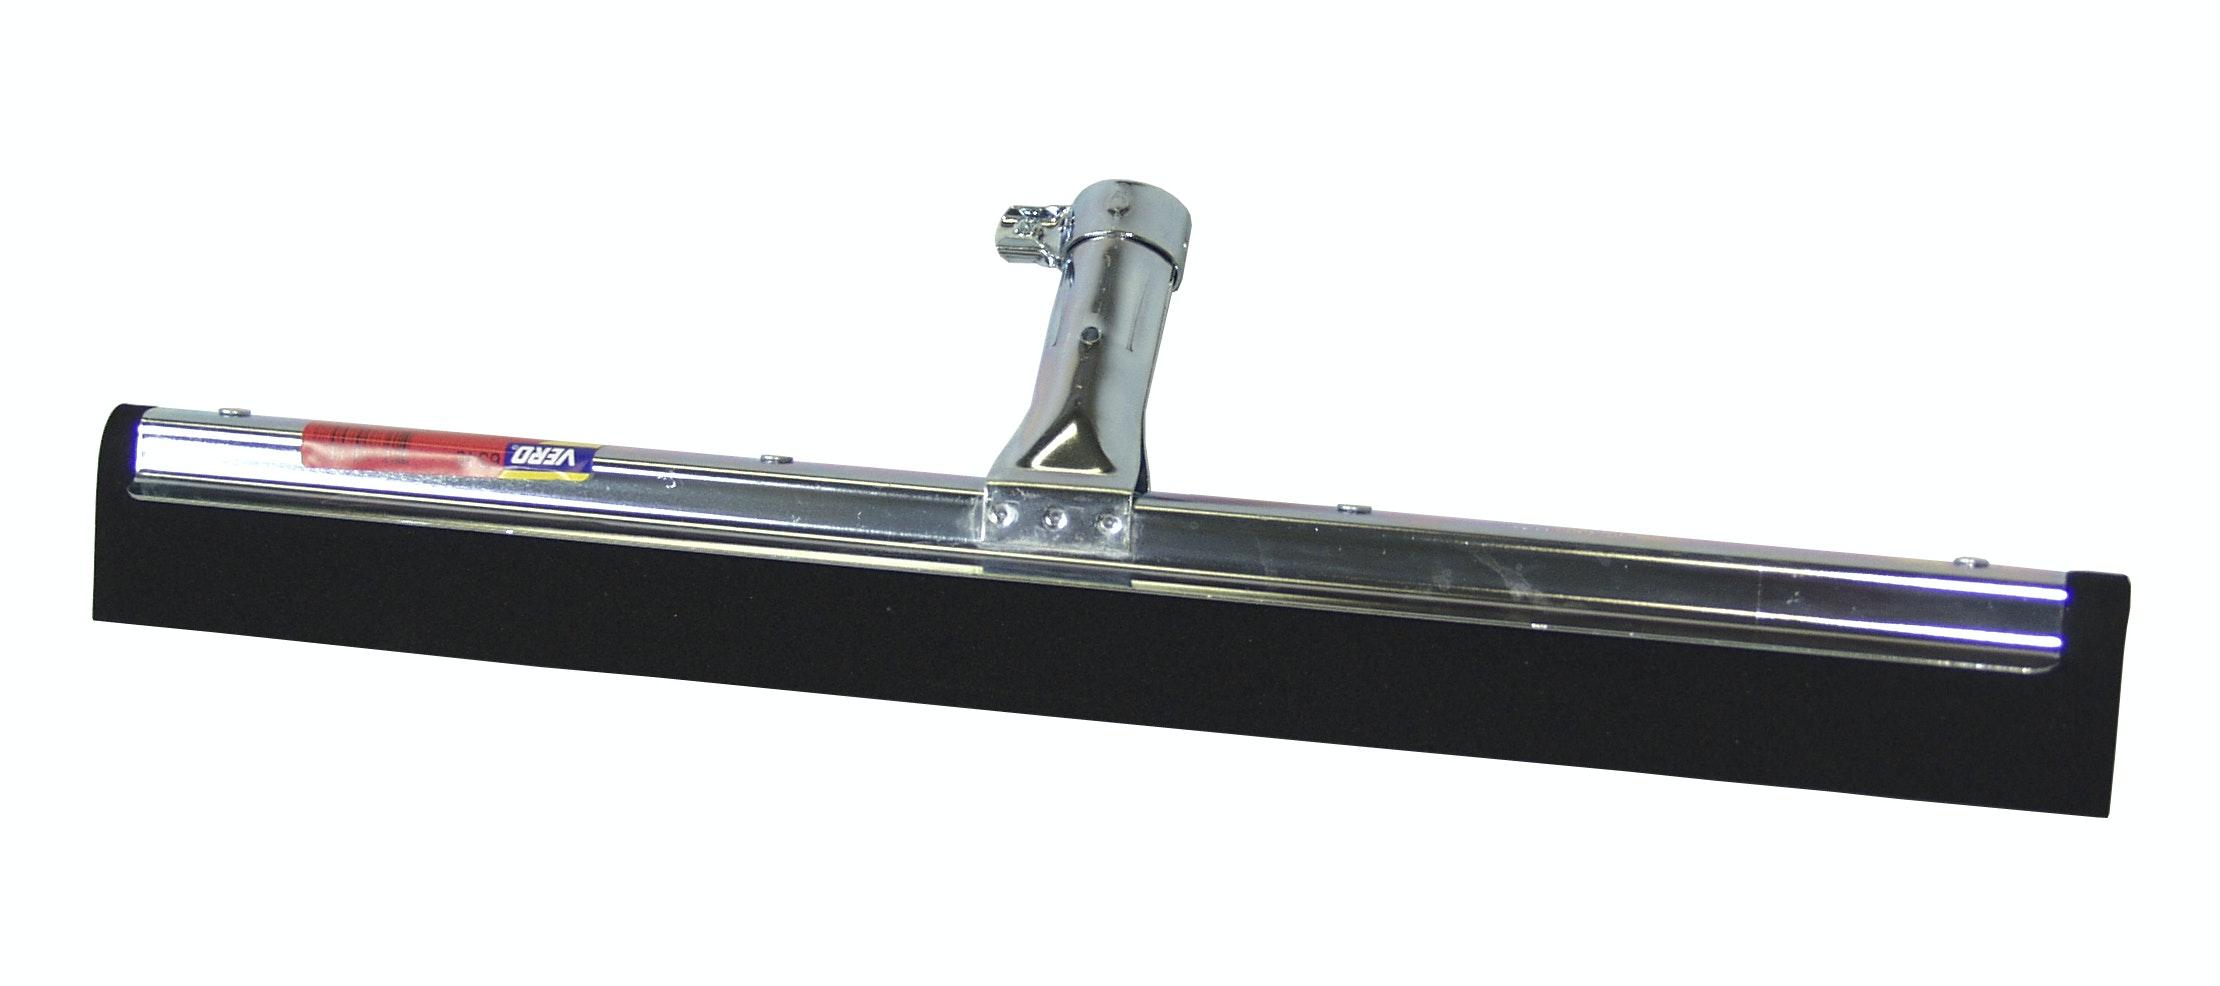 Golvraka Kron 45cm Svart Med Vattenkant 16817